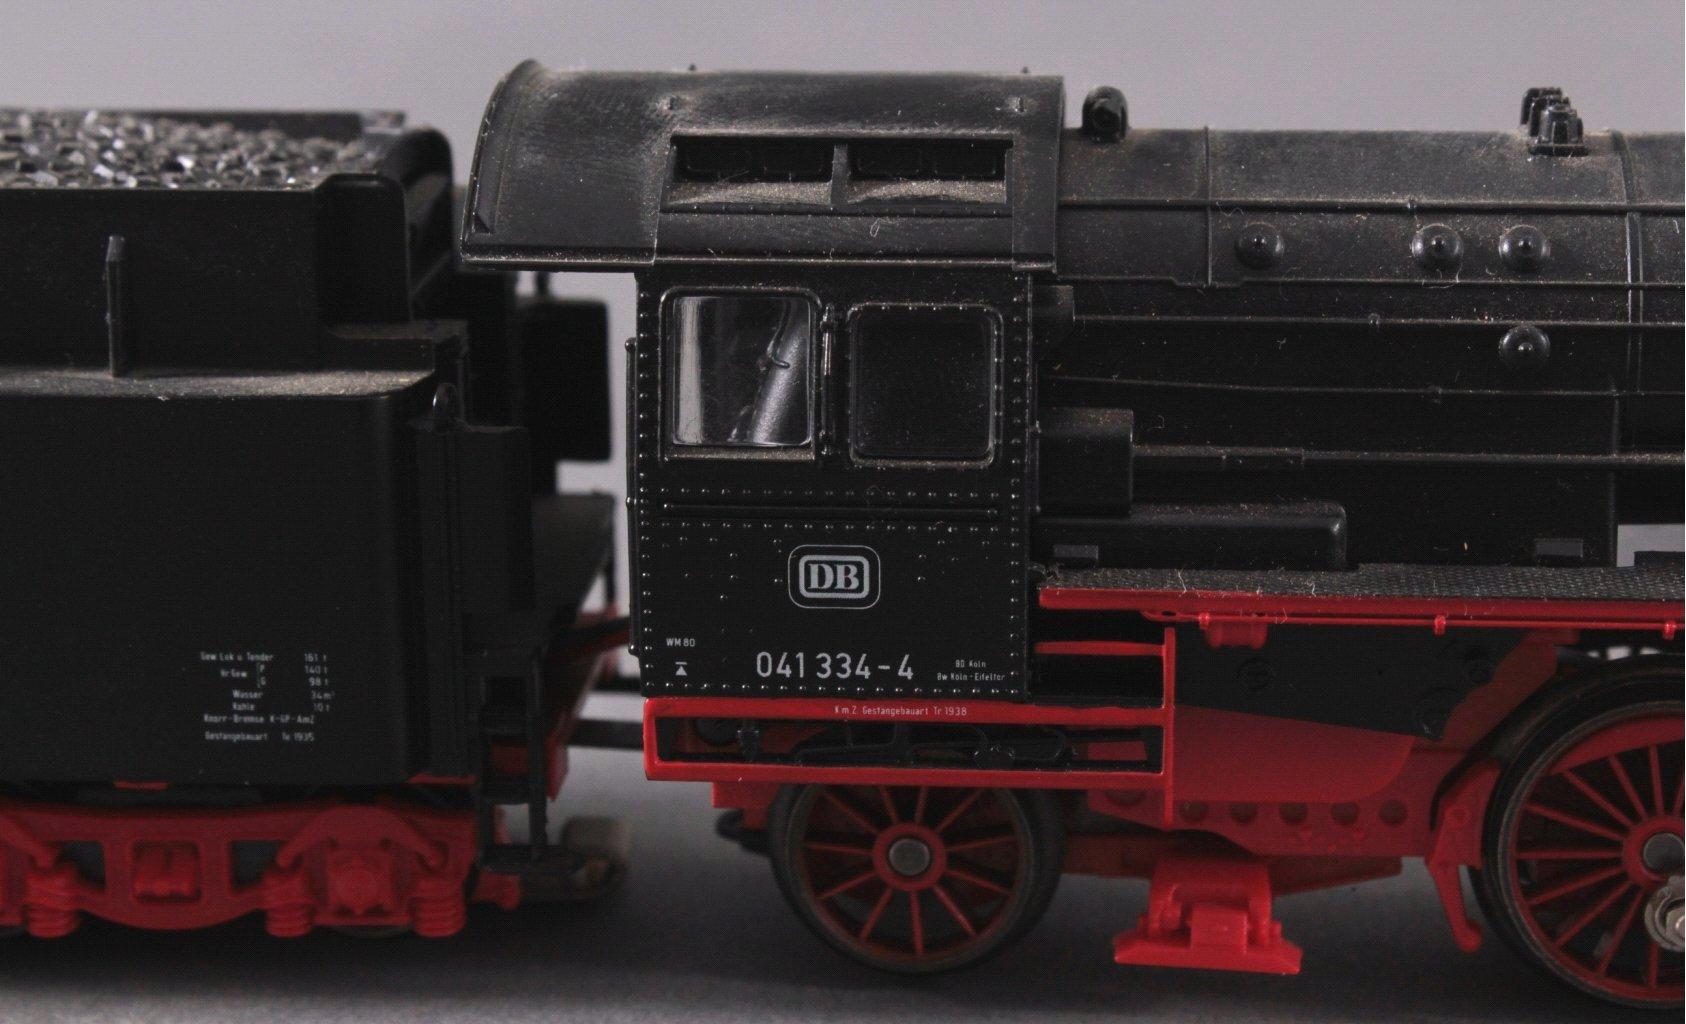 Märklin BR 041334-4 Dampf-Lok DB in schwarz mit-2